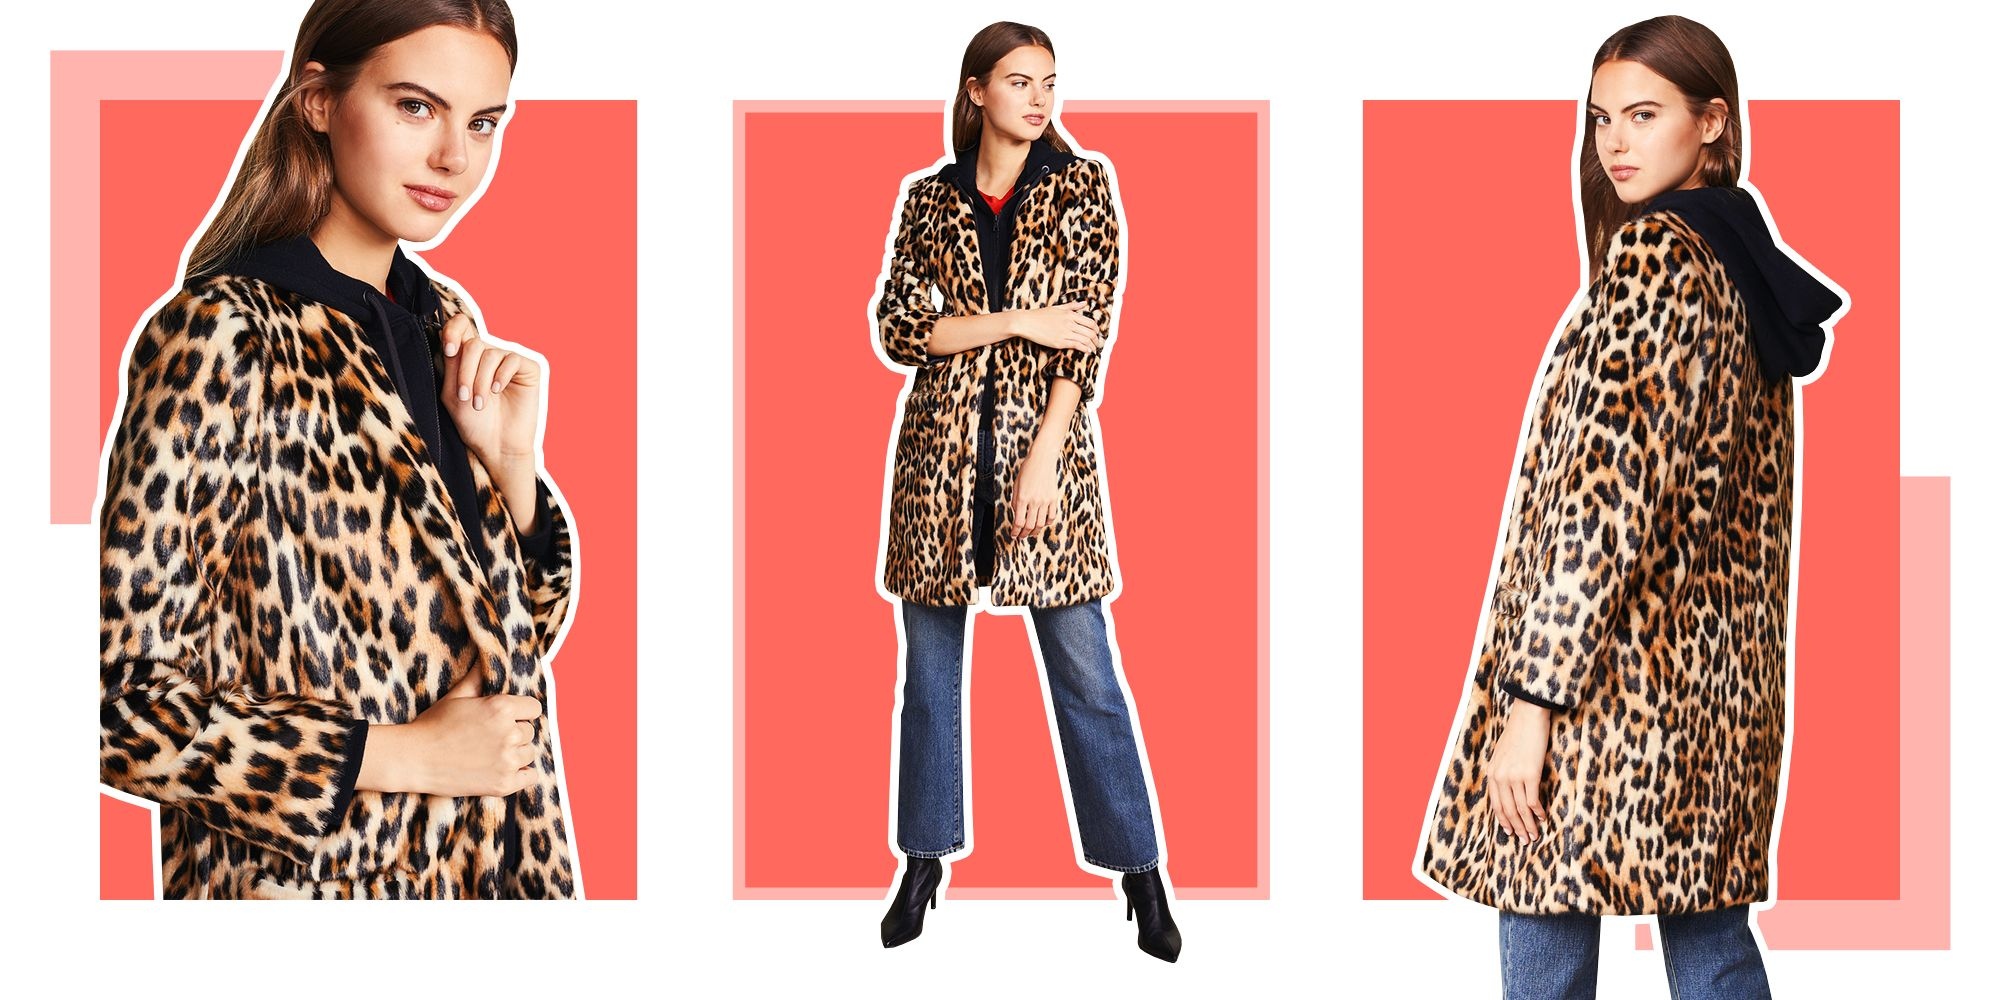 40b8e03442 12 Best Leopard Coats for Winter 2018 - Stylish Leopard Print Jackets